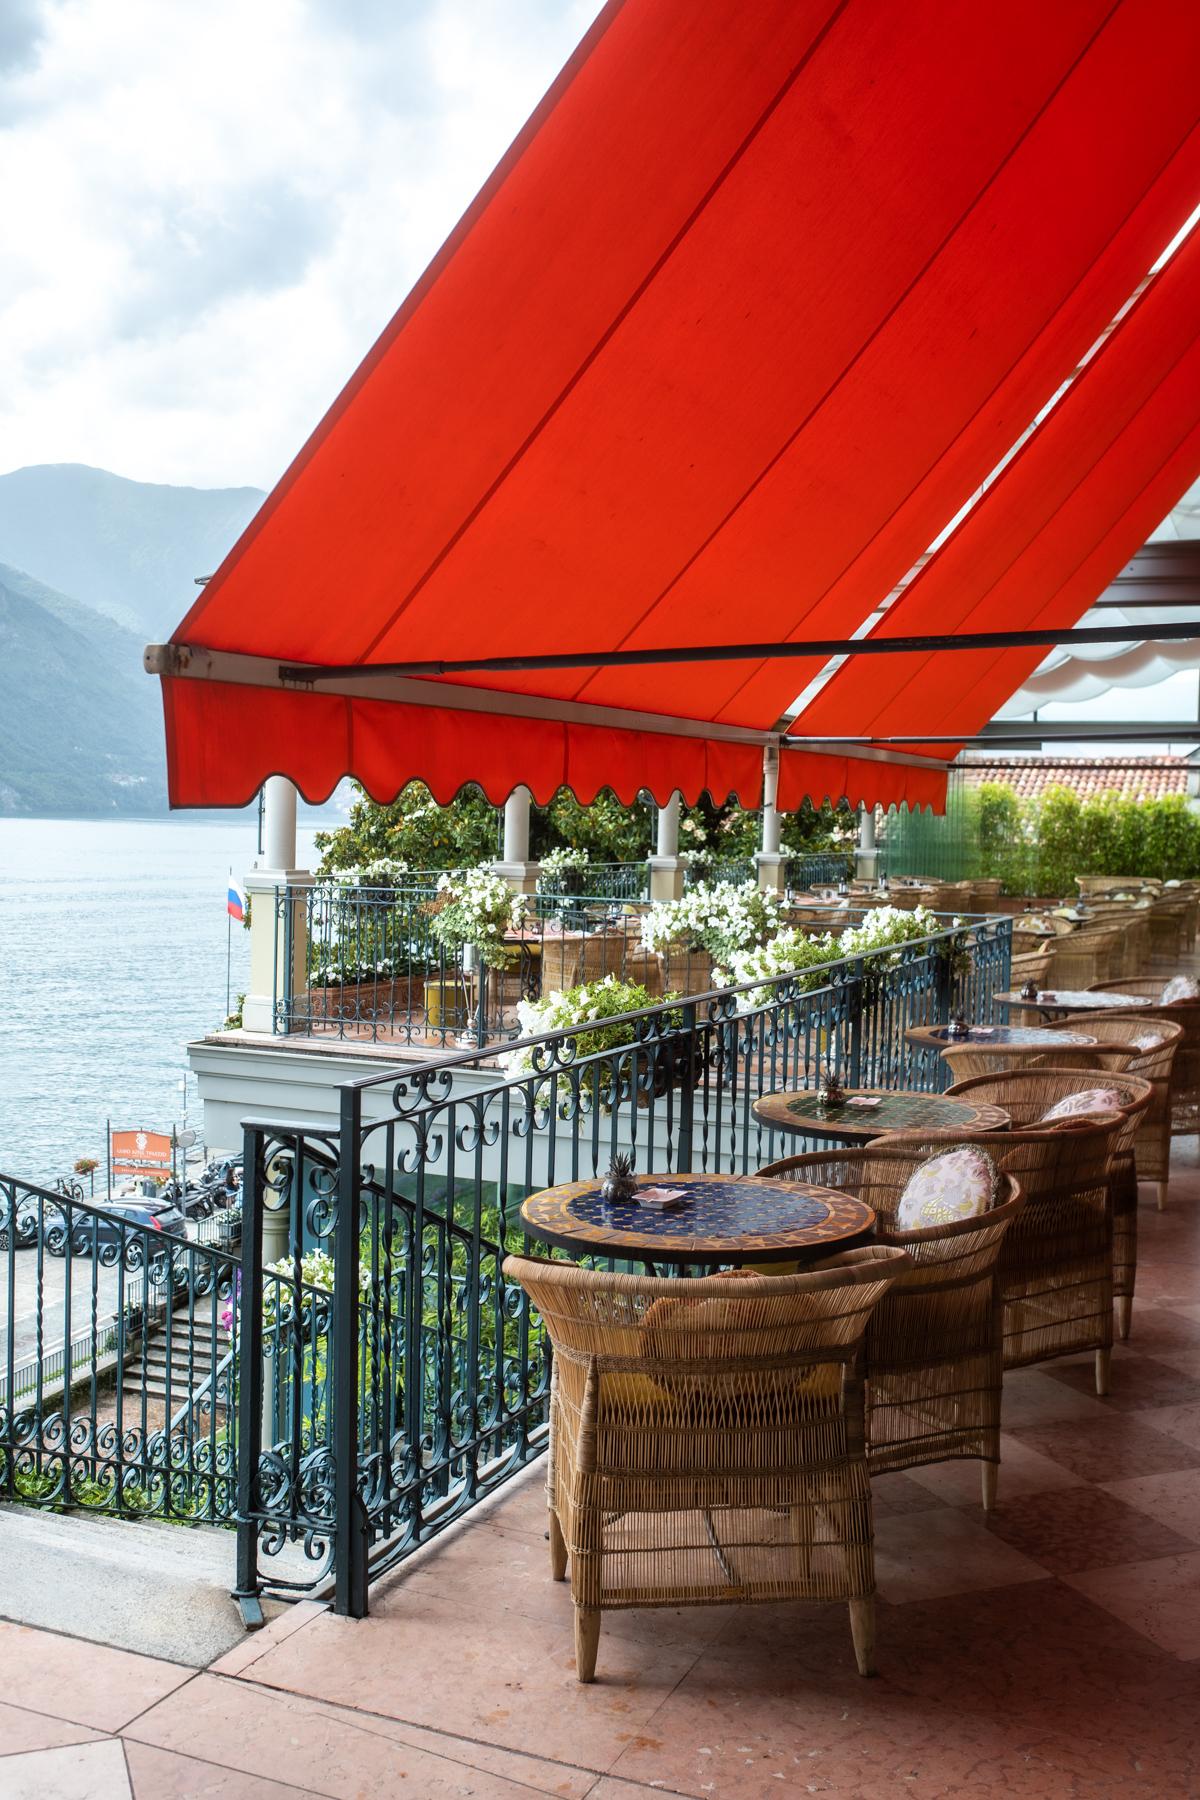 Stacie Flinner x Grand Hotel Tremezzo x Maupin Travel-46.jpg